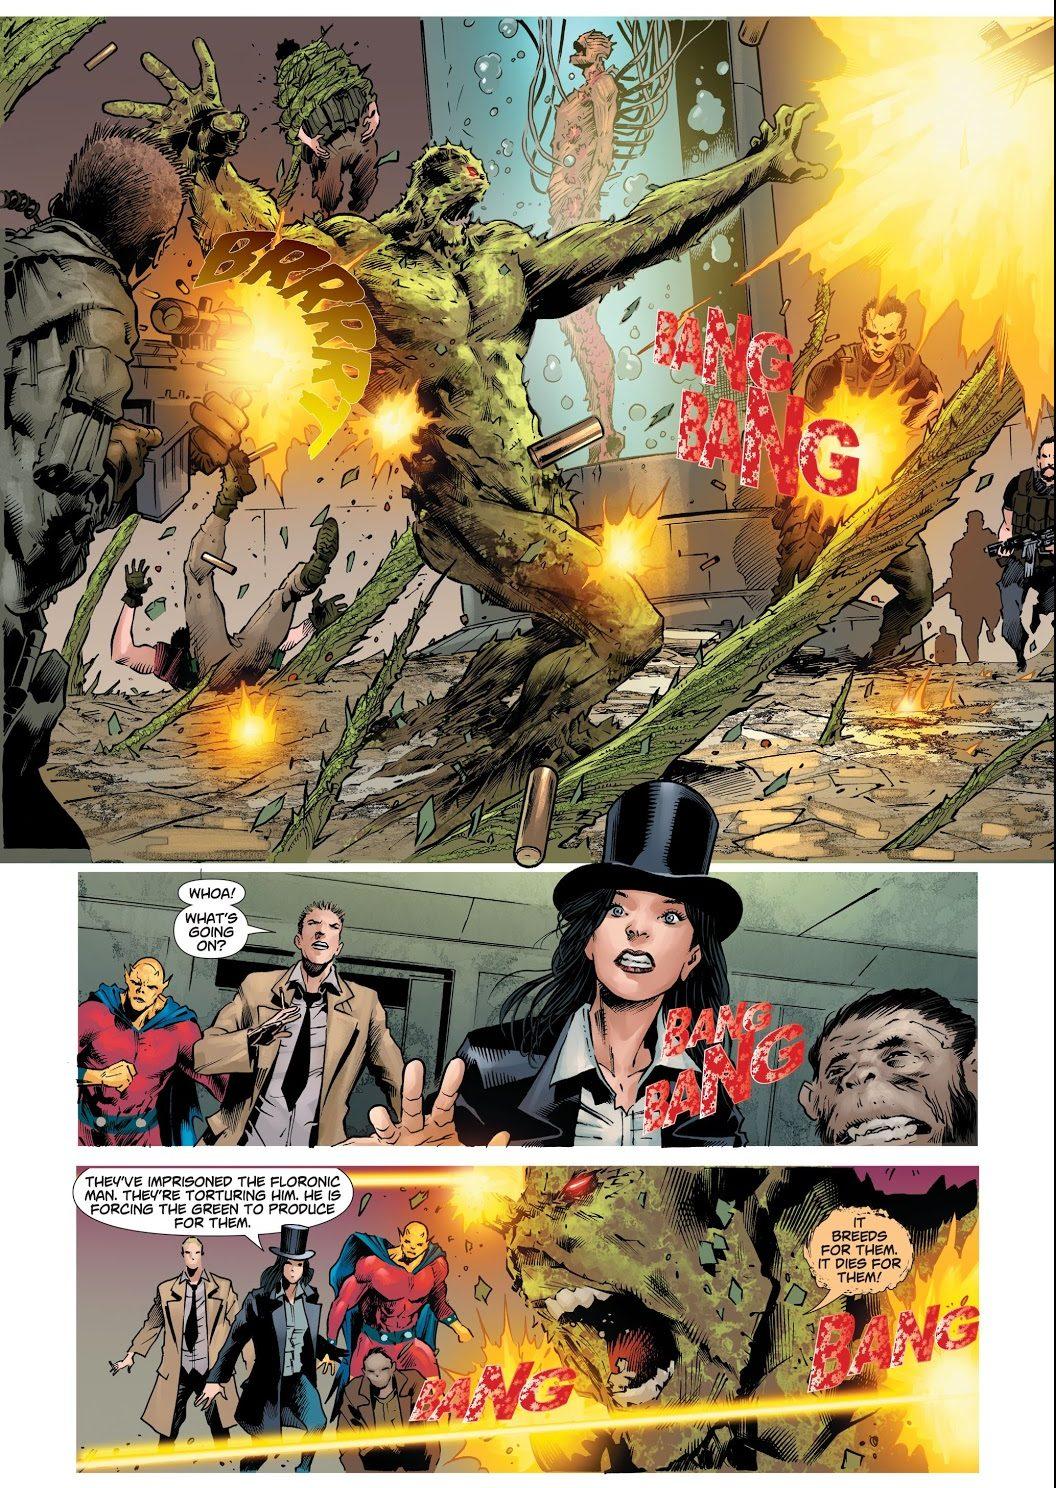 Swamp Thing Kills Maxwell Lord (DCeased)